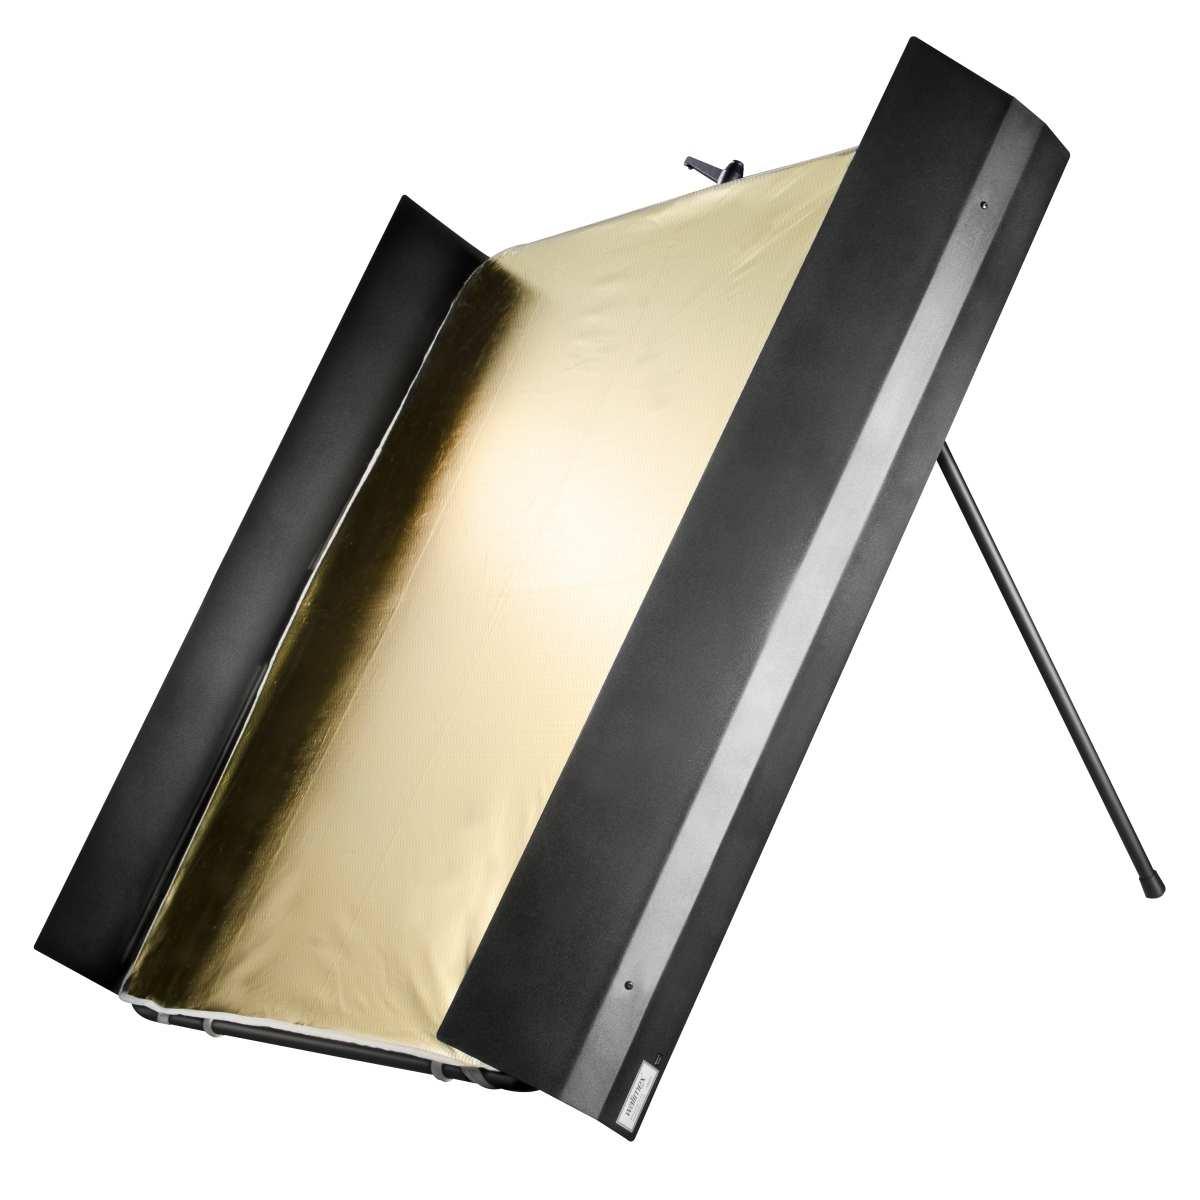 Walimex pro Reflector Panel with Barn Doors, 1x1m